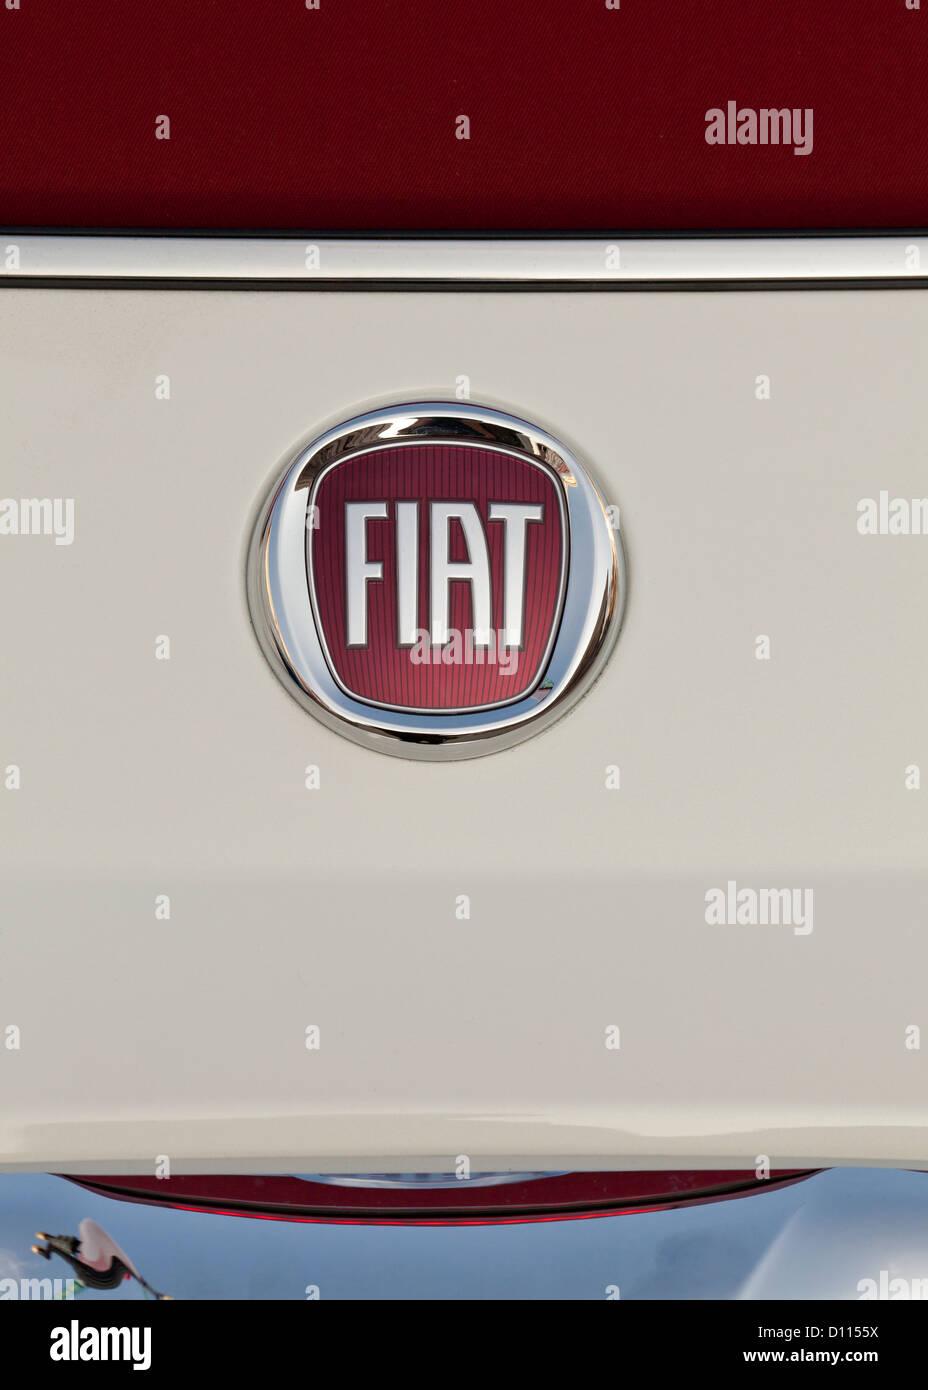 Fiat logo on the 500 Abarth - Stock Image